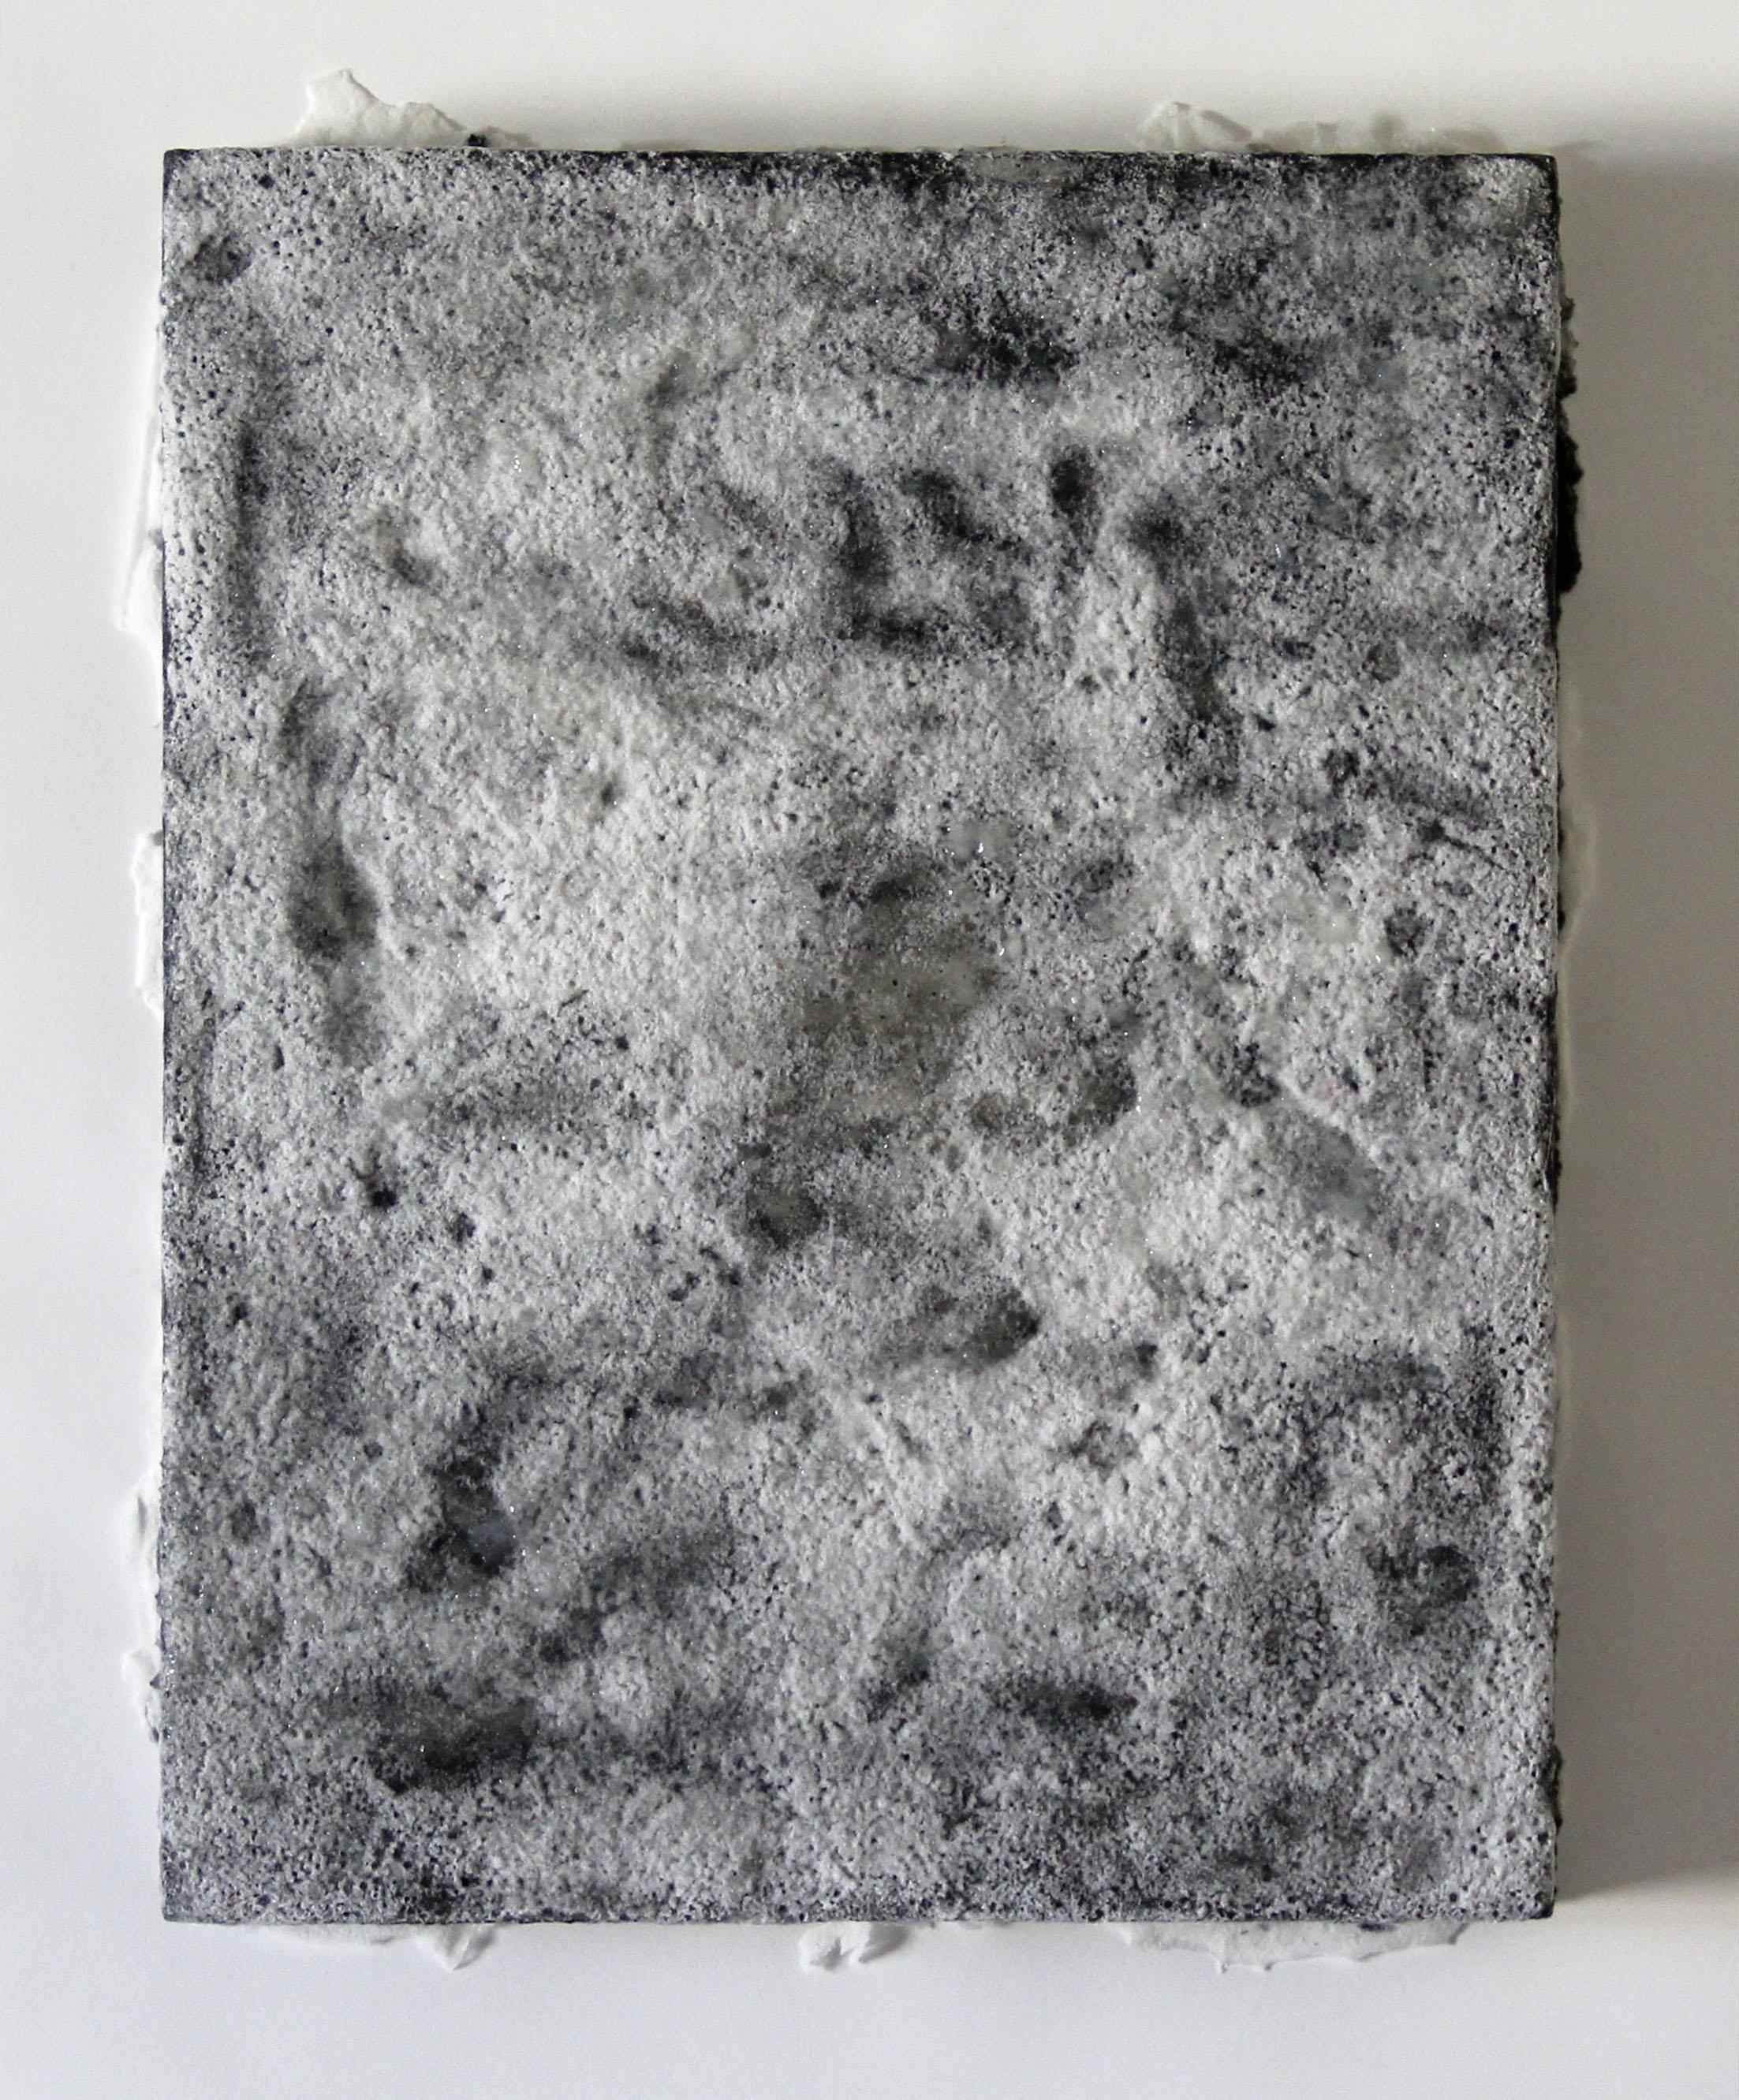 borax 1  2014  borax, graphite, acrylic on plexiglass  14 x 11 x 1.5 inches